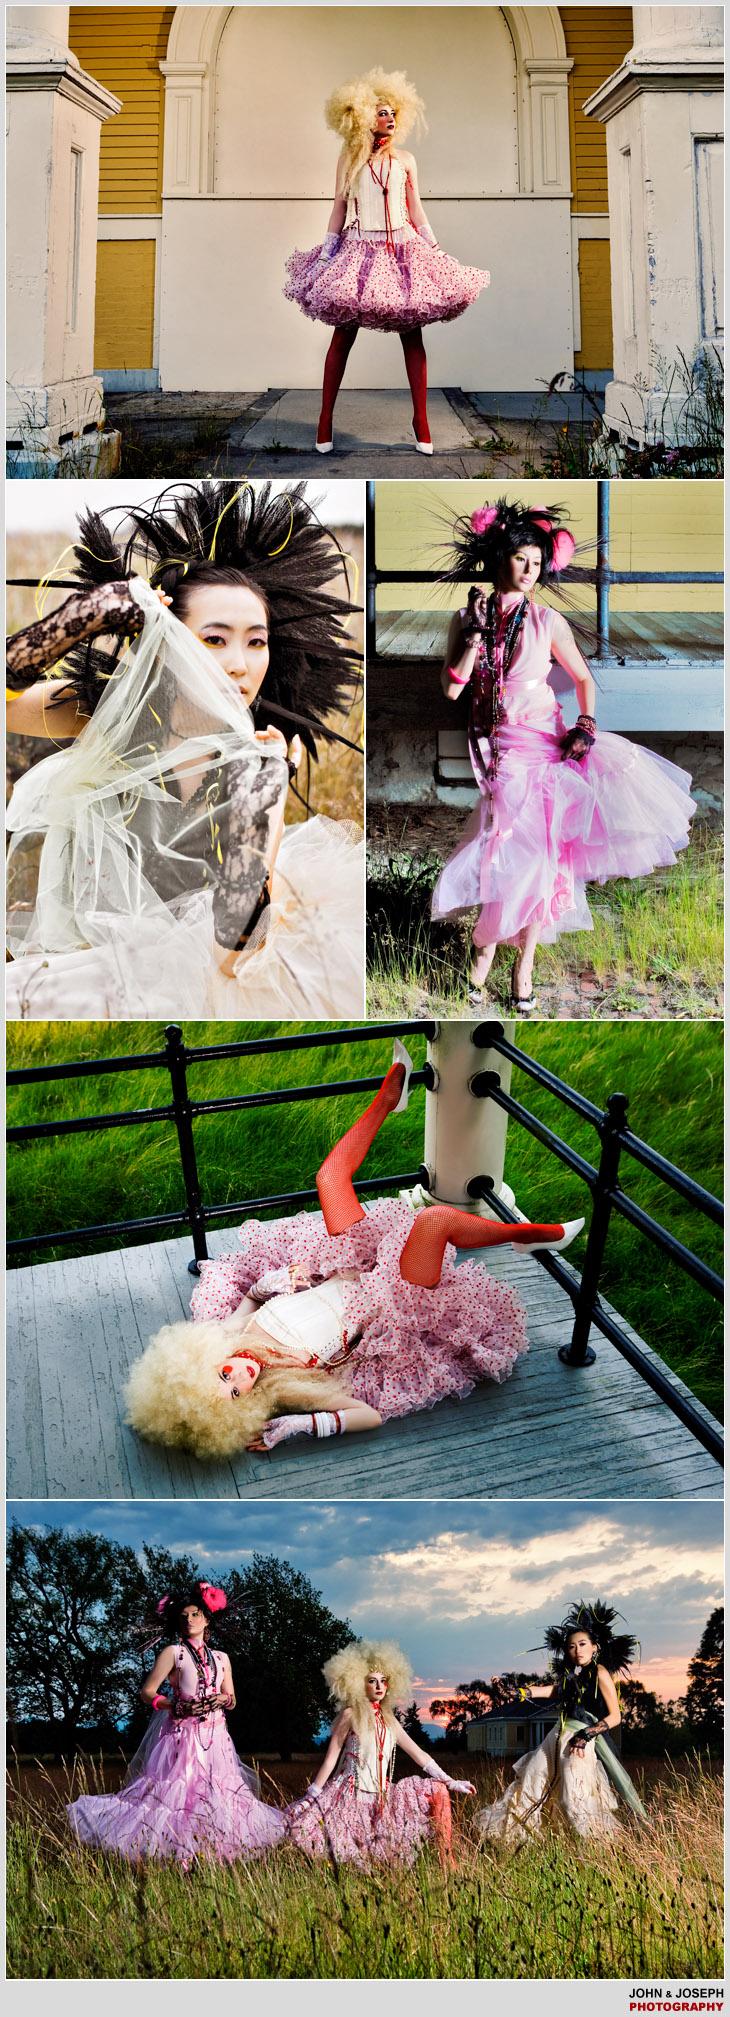 Models- Iana Klenz, Jane Hong, Michelle Brayton. Mua- Pink Beauty. Jul 25, 2008 Bustles And Ruffles.   Story-MH